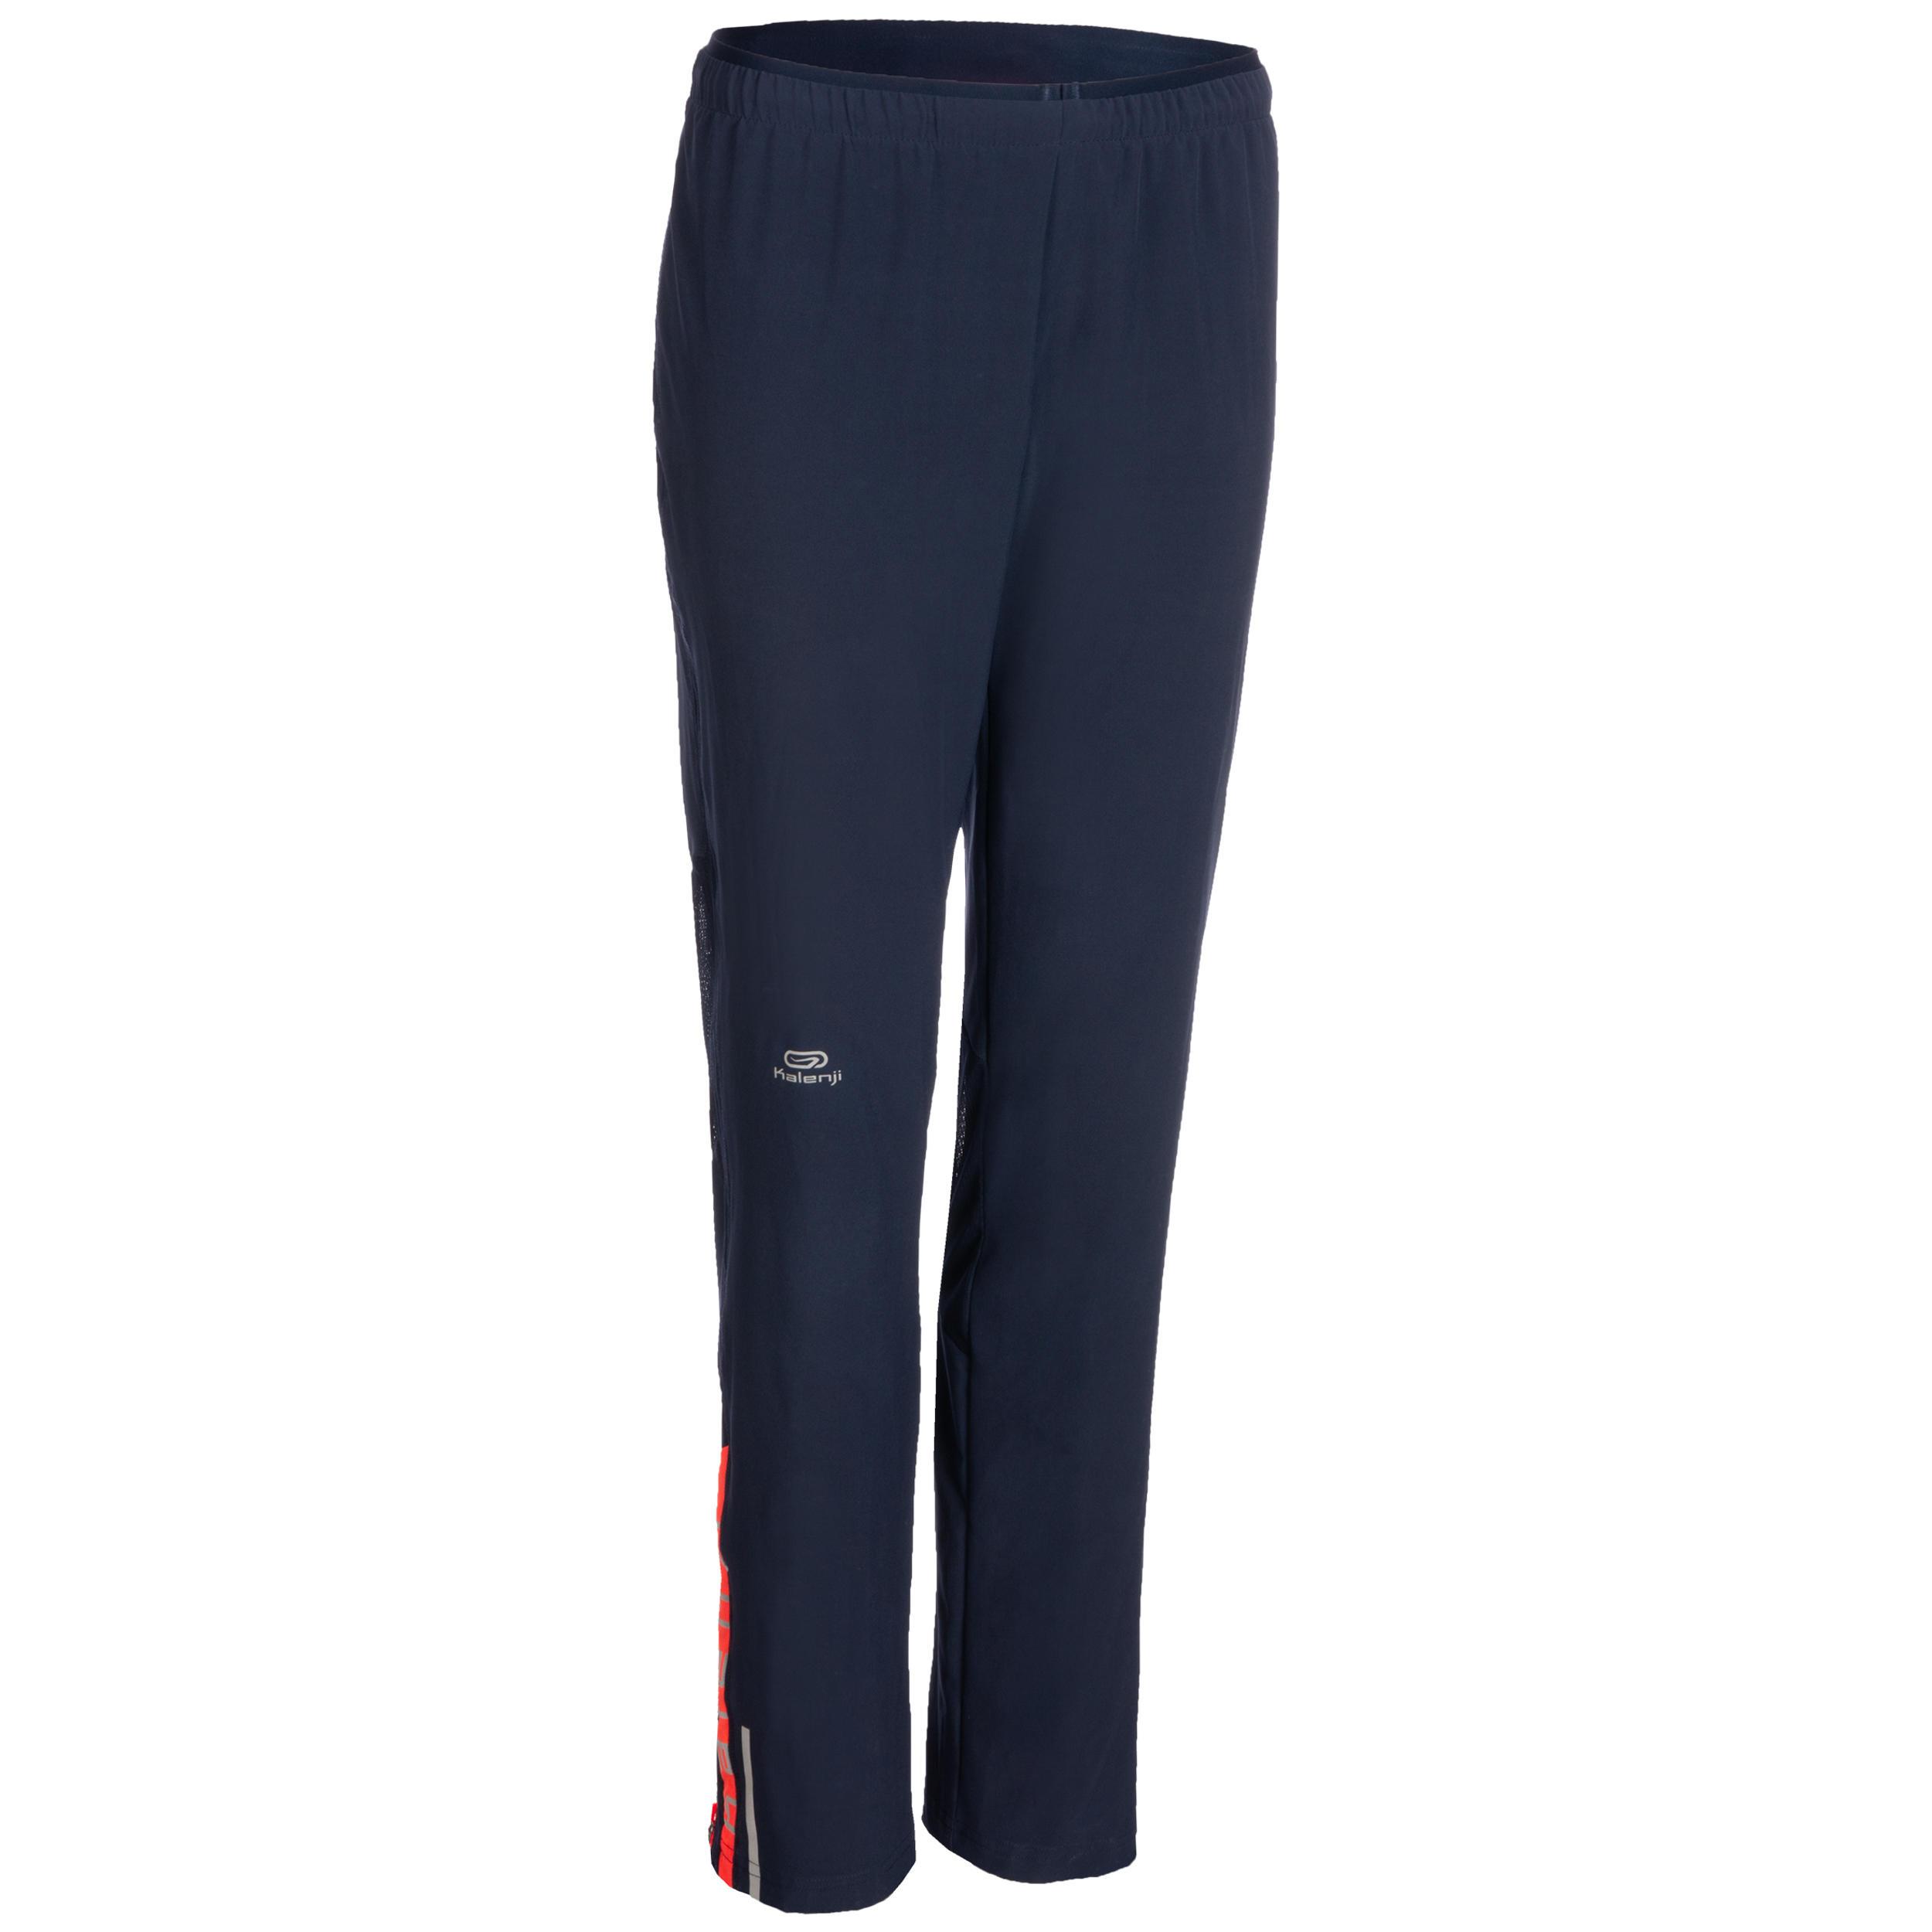 Laufhose lang Leichtathletik Damen dunkelblau